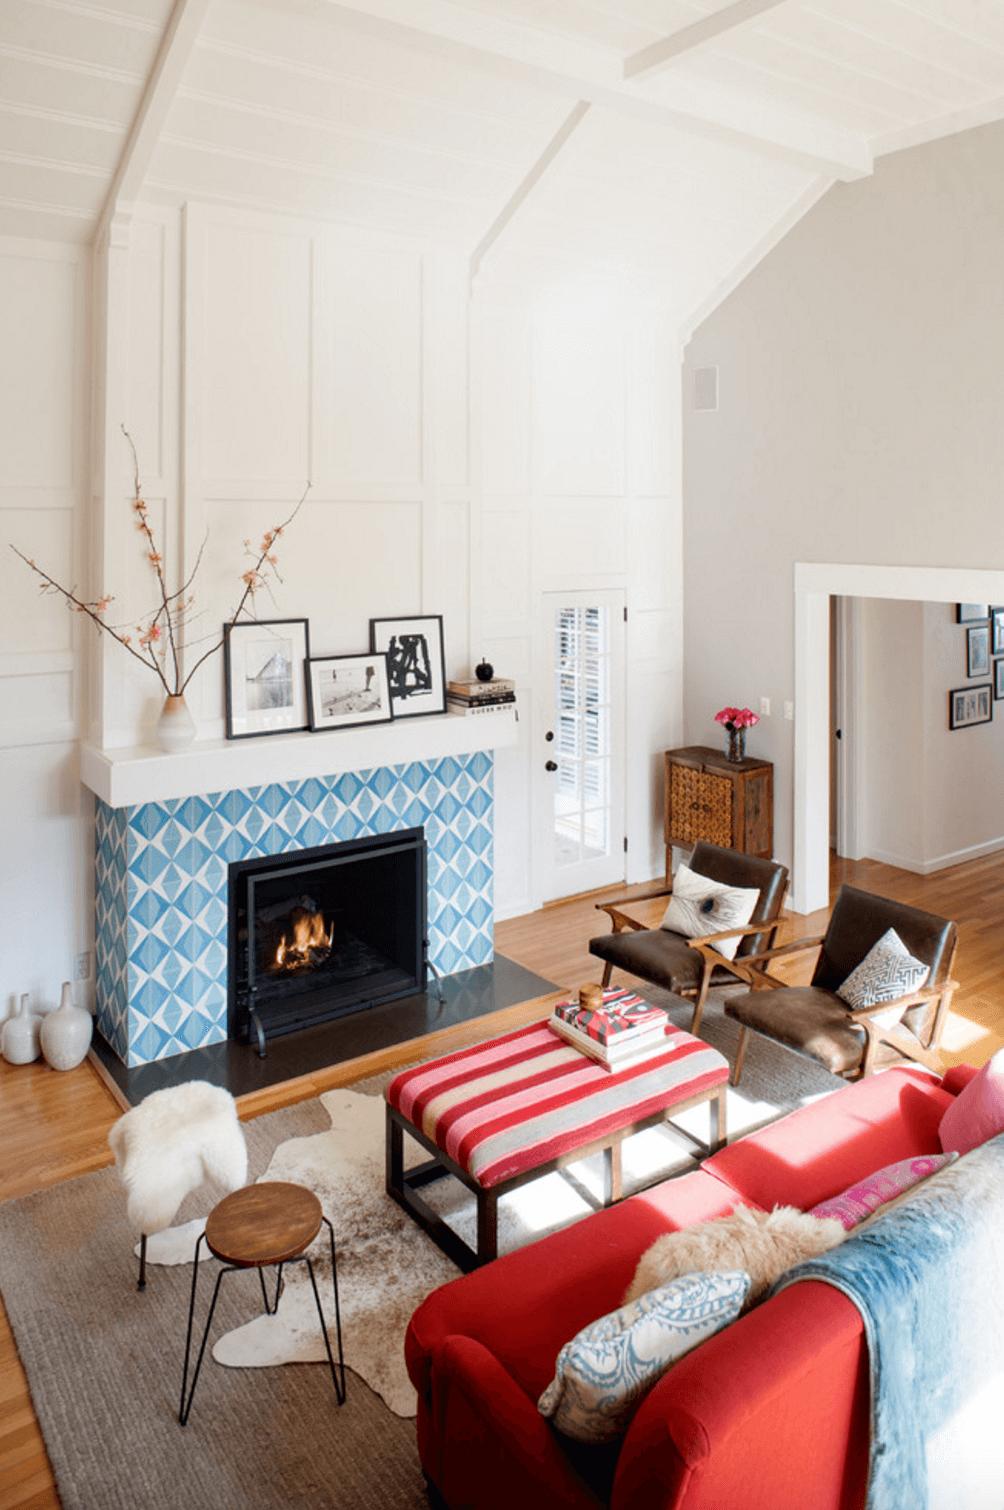 Mantel Decorating Ideas Freshome Fireplace Decor Living Room Mantel Fireplace Mantels